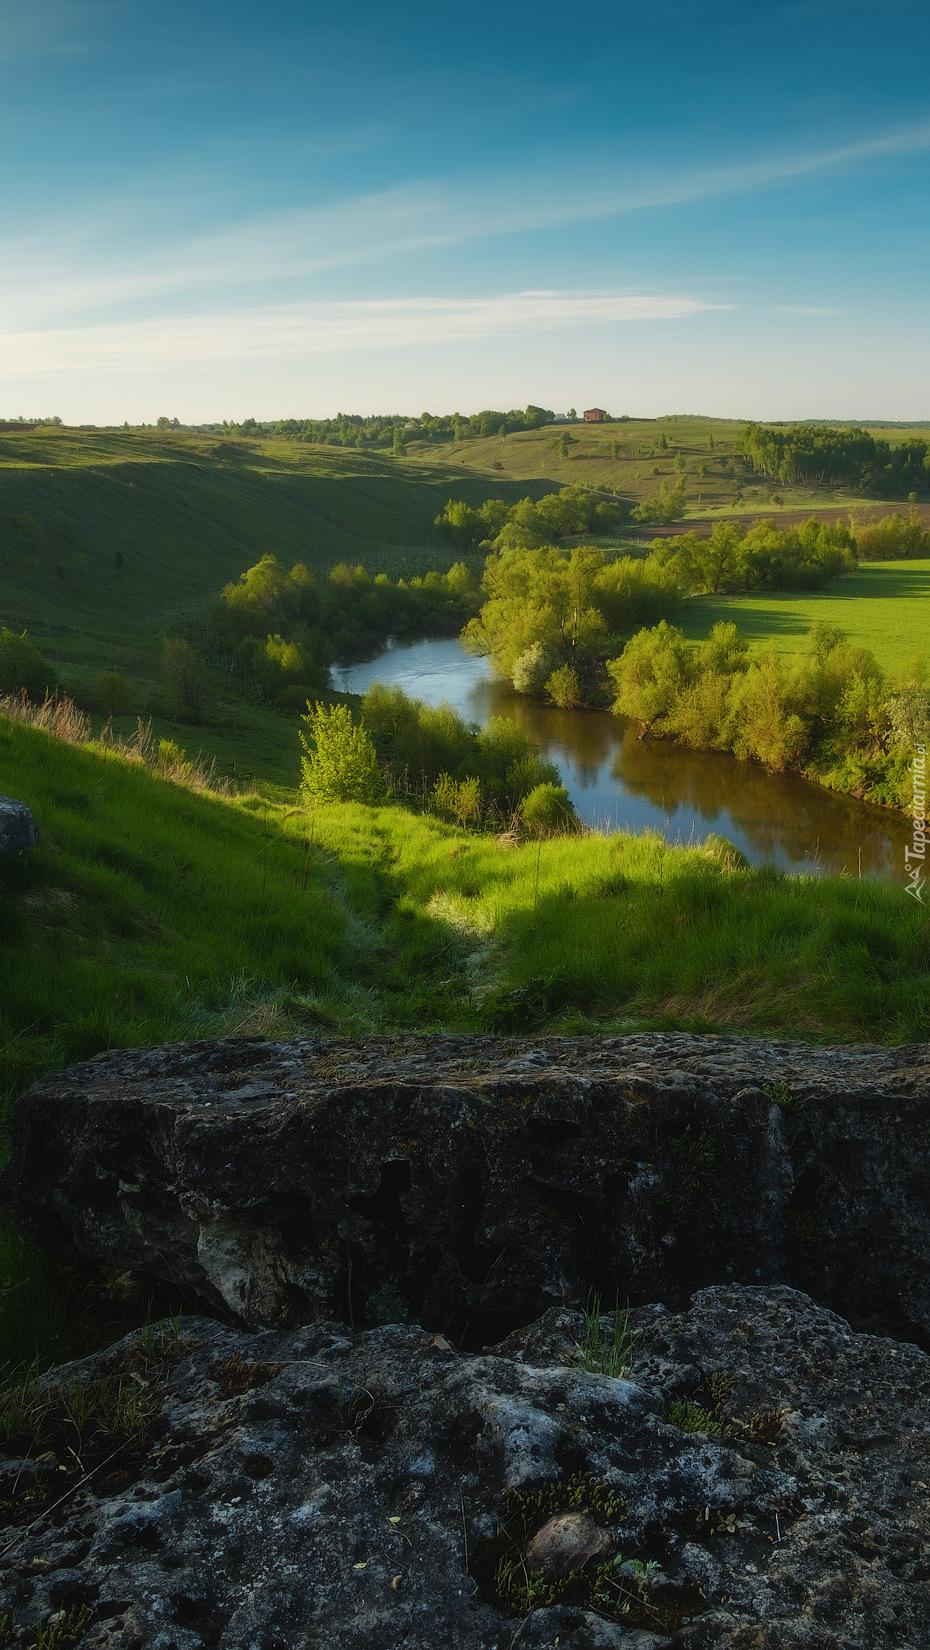 Rzeka Osyotr wśród zieleni